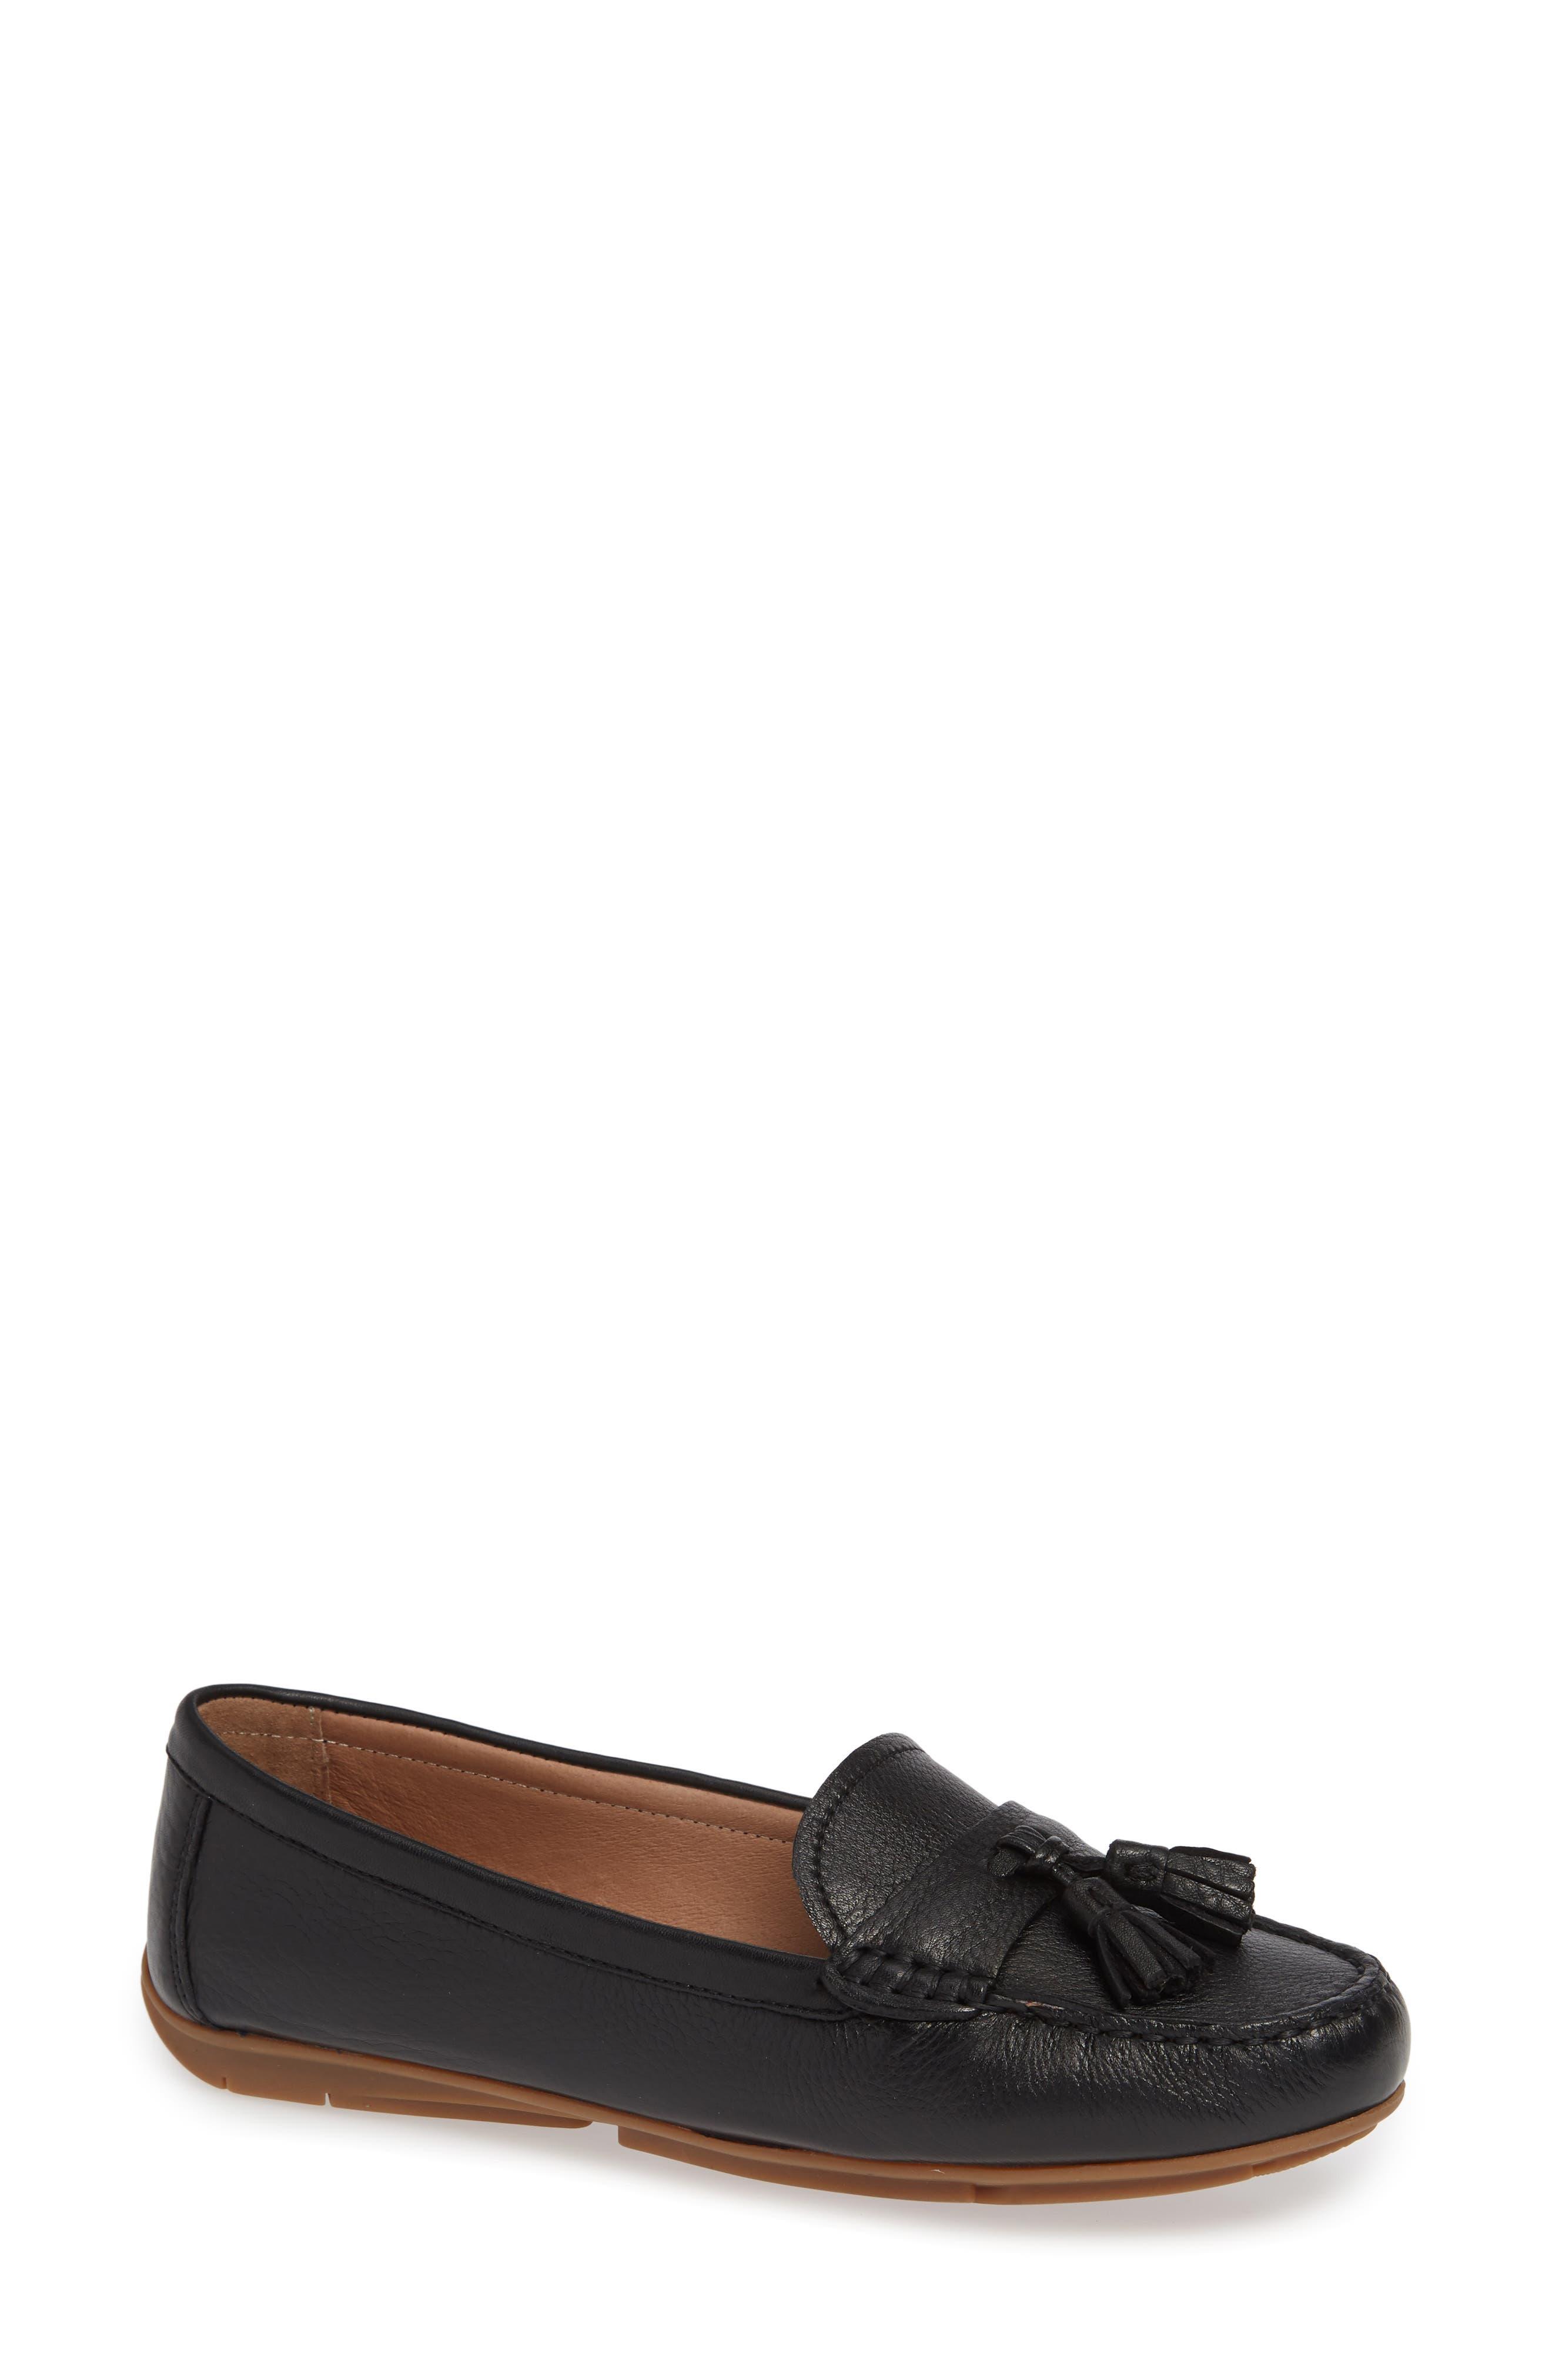 JOSEF SEIBEL Elina 01 Flat, Main, color, BLACK LEATHER